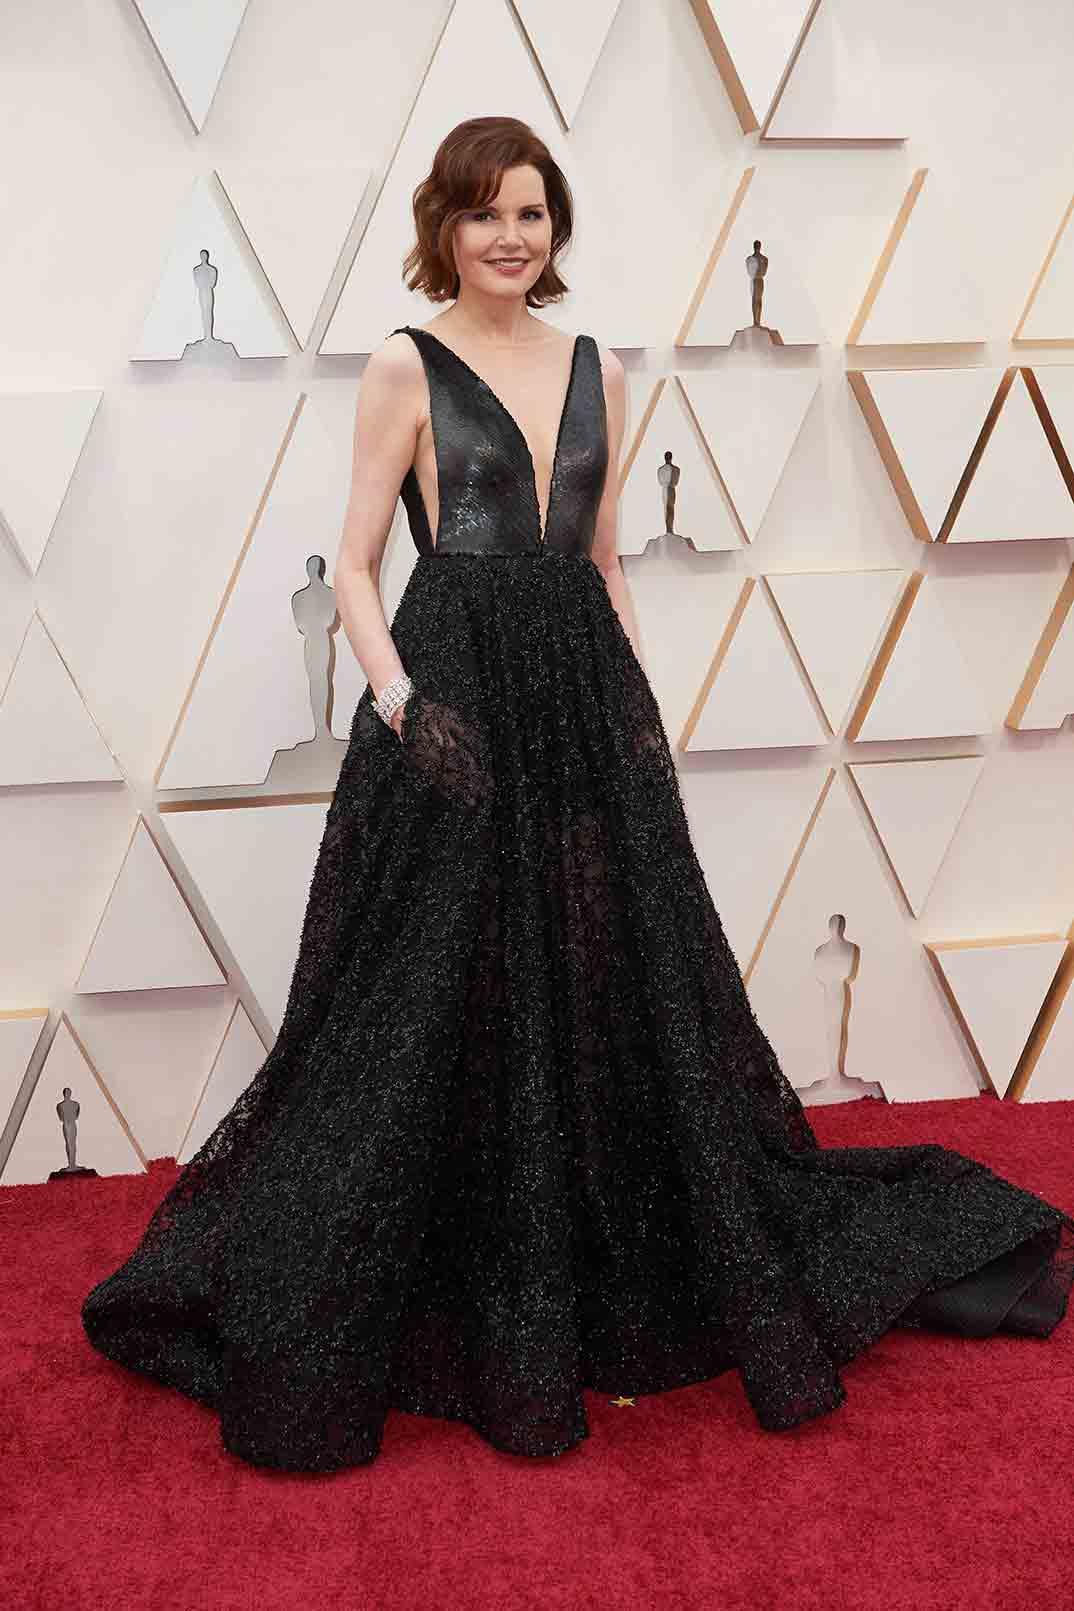 Geena Davis - Oscars 2020 © A.M.P.A.S.